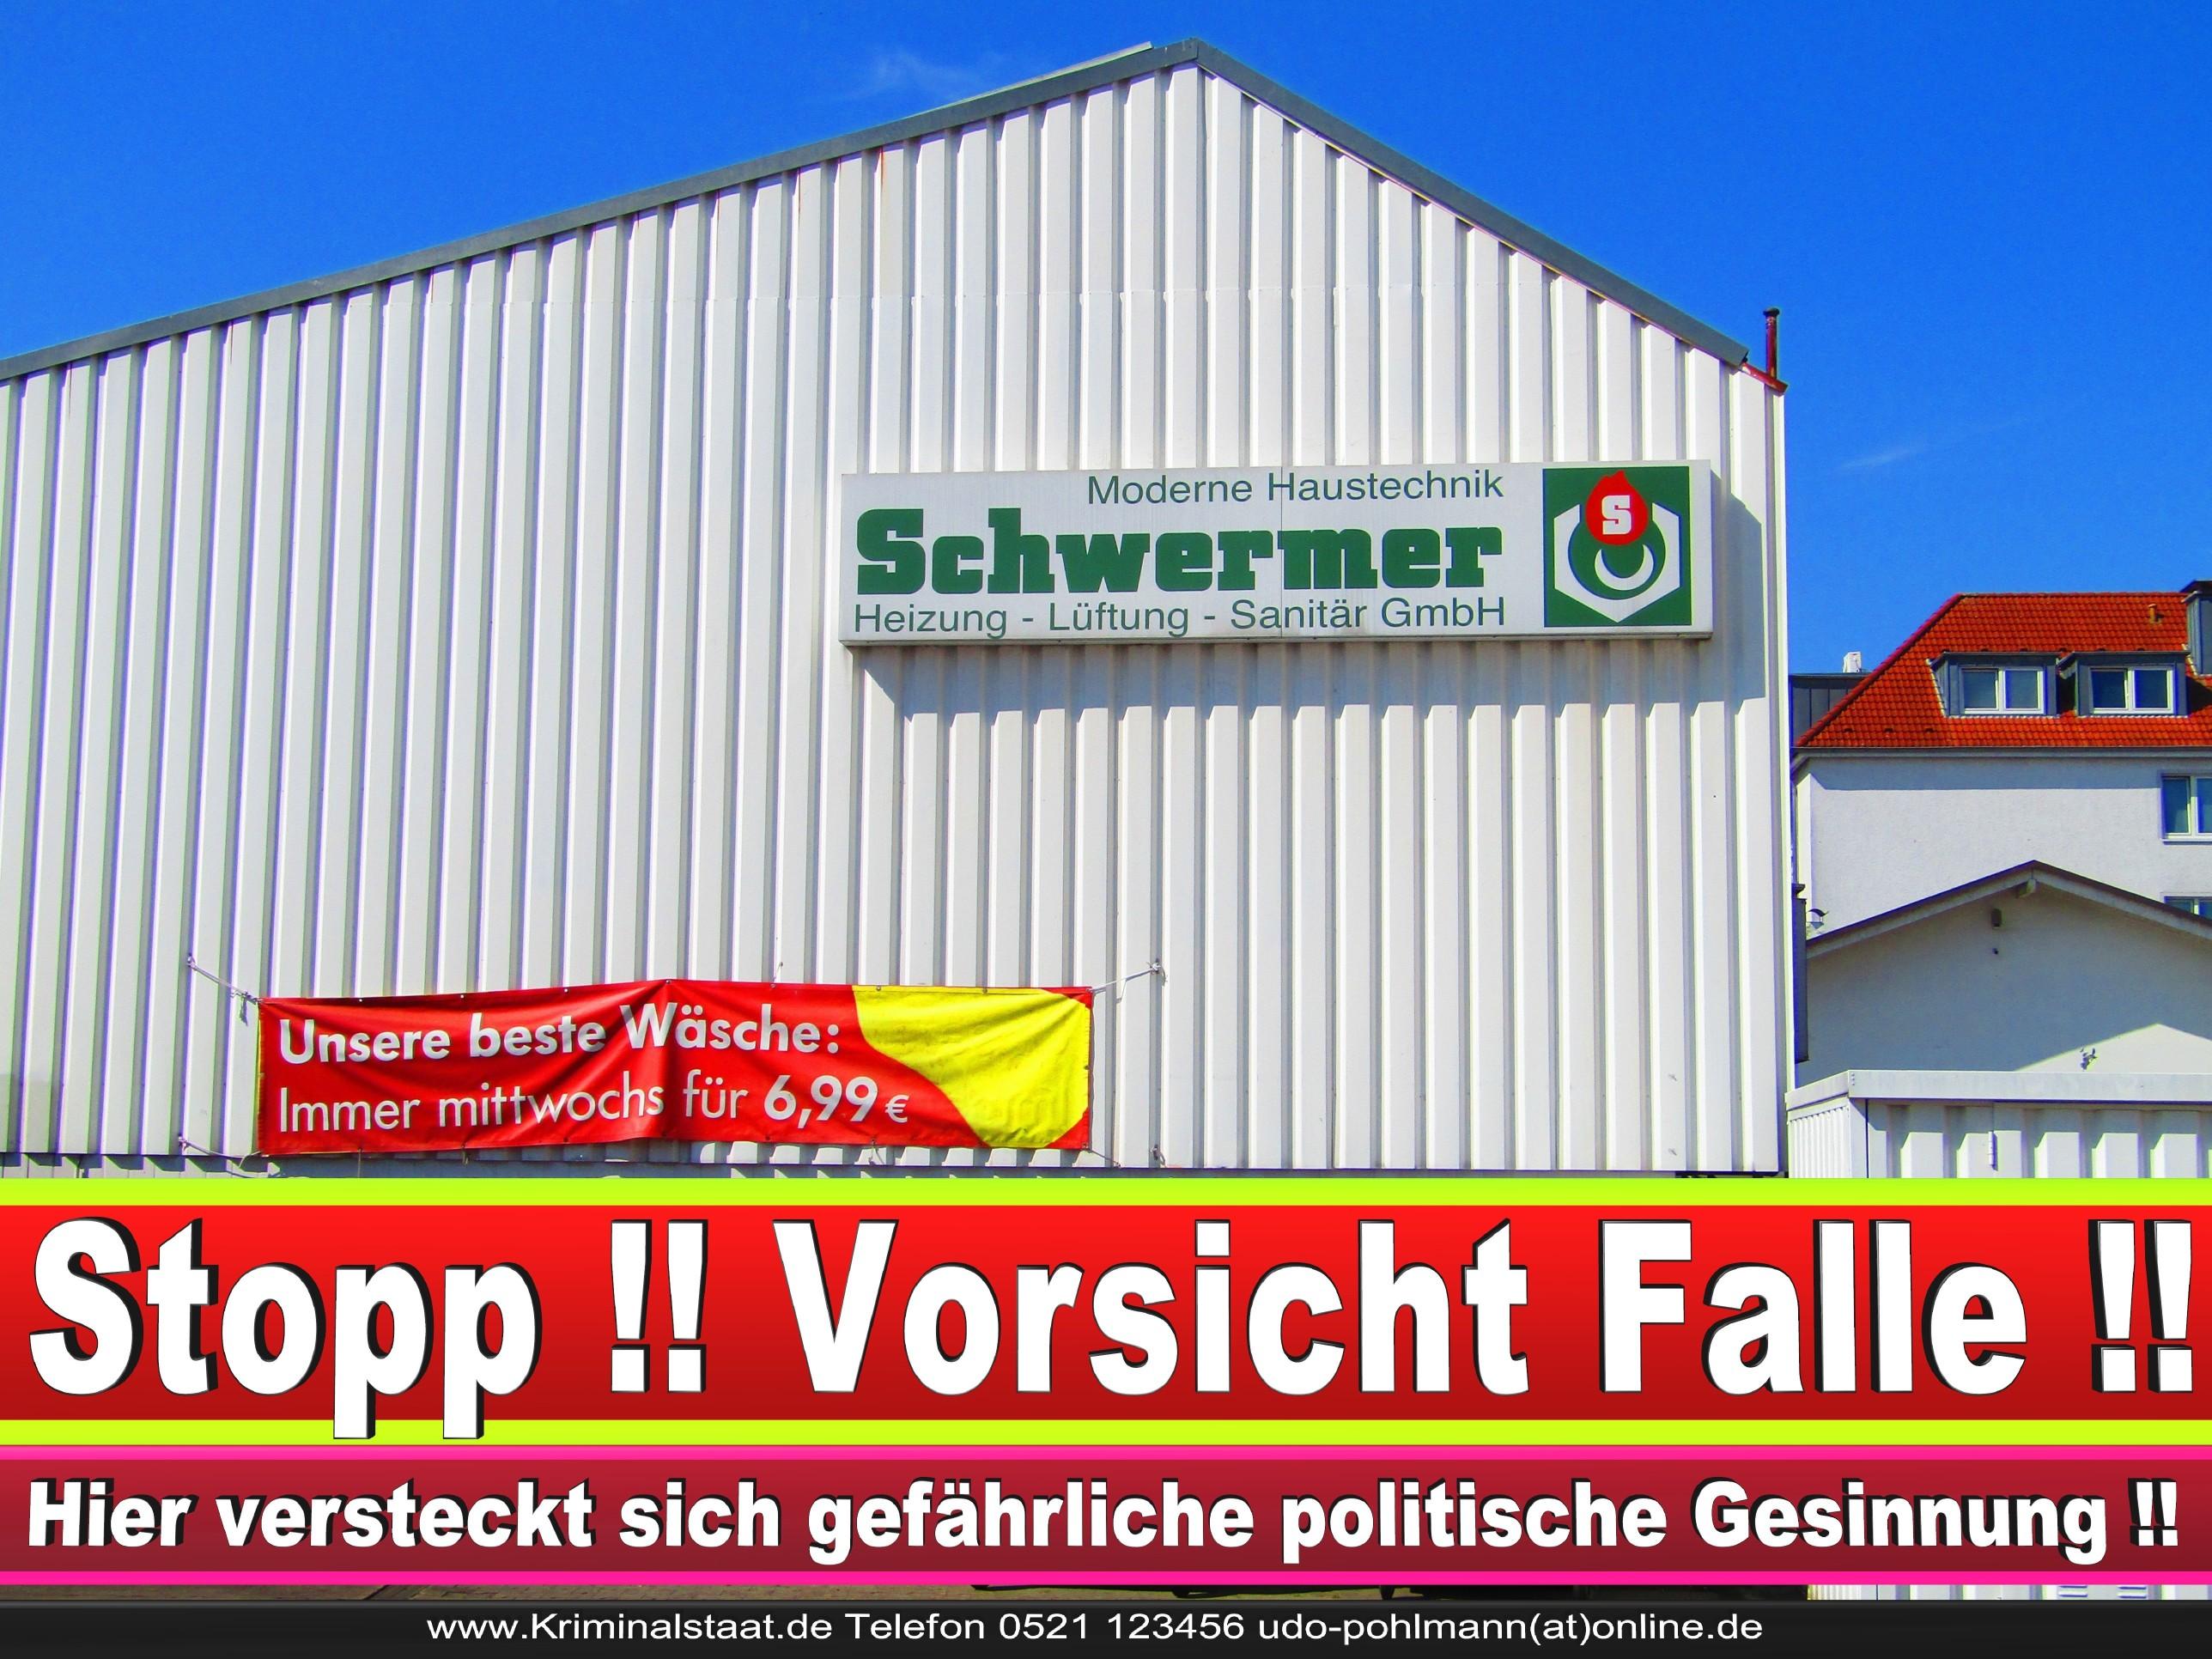 SCHWERMER BIELEFELD HEIZUNG SANITÄR CDU BIELEFELD 5 LANDTAGSWAHL BUNDESTAGSWAHL BÜRGERMEISTERWAHL